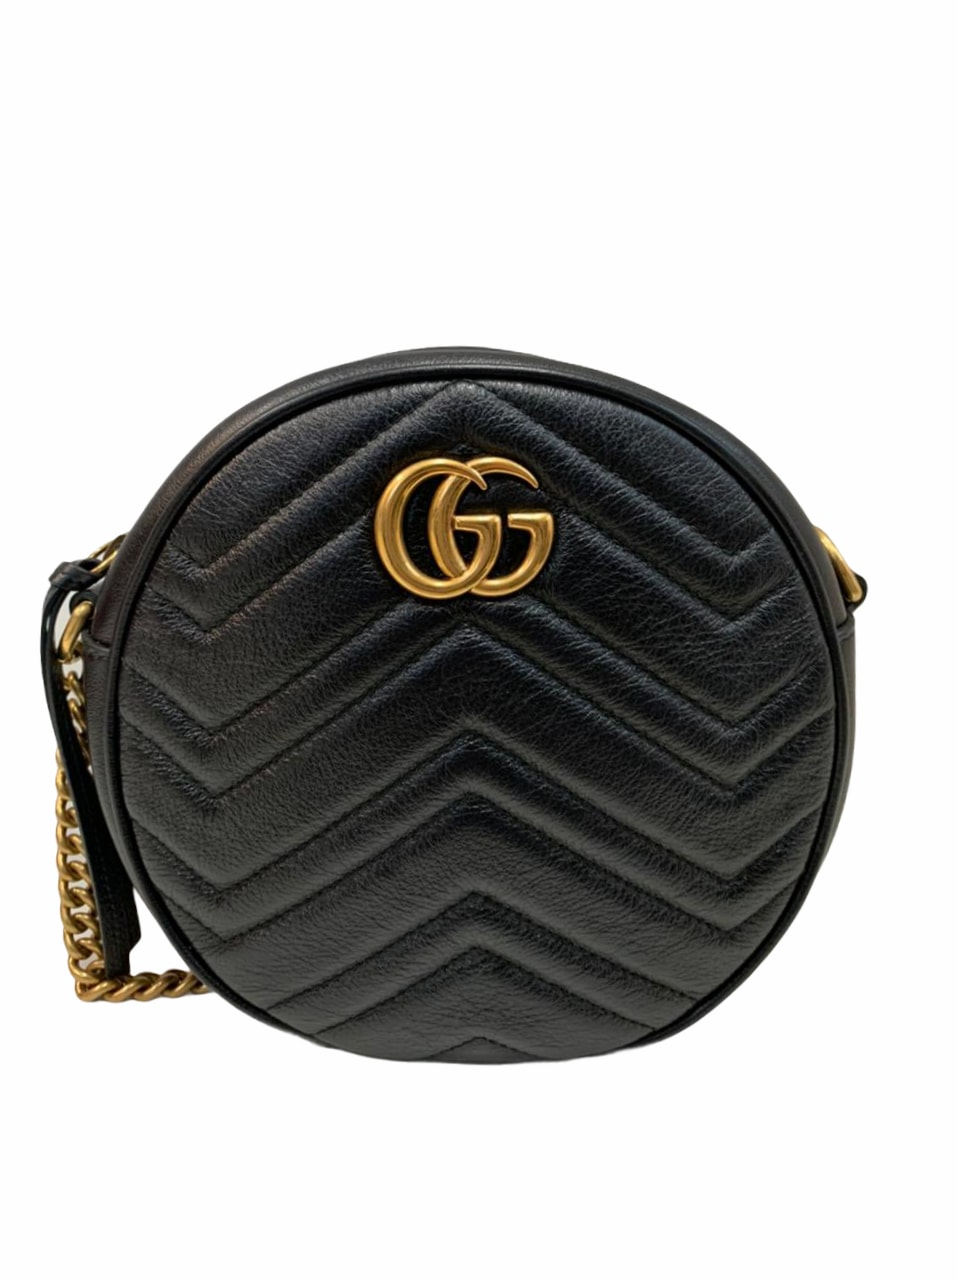 Bolsa Gucci GG Marmont Round Matelassé Preta